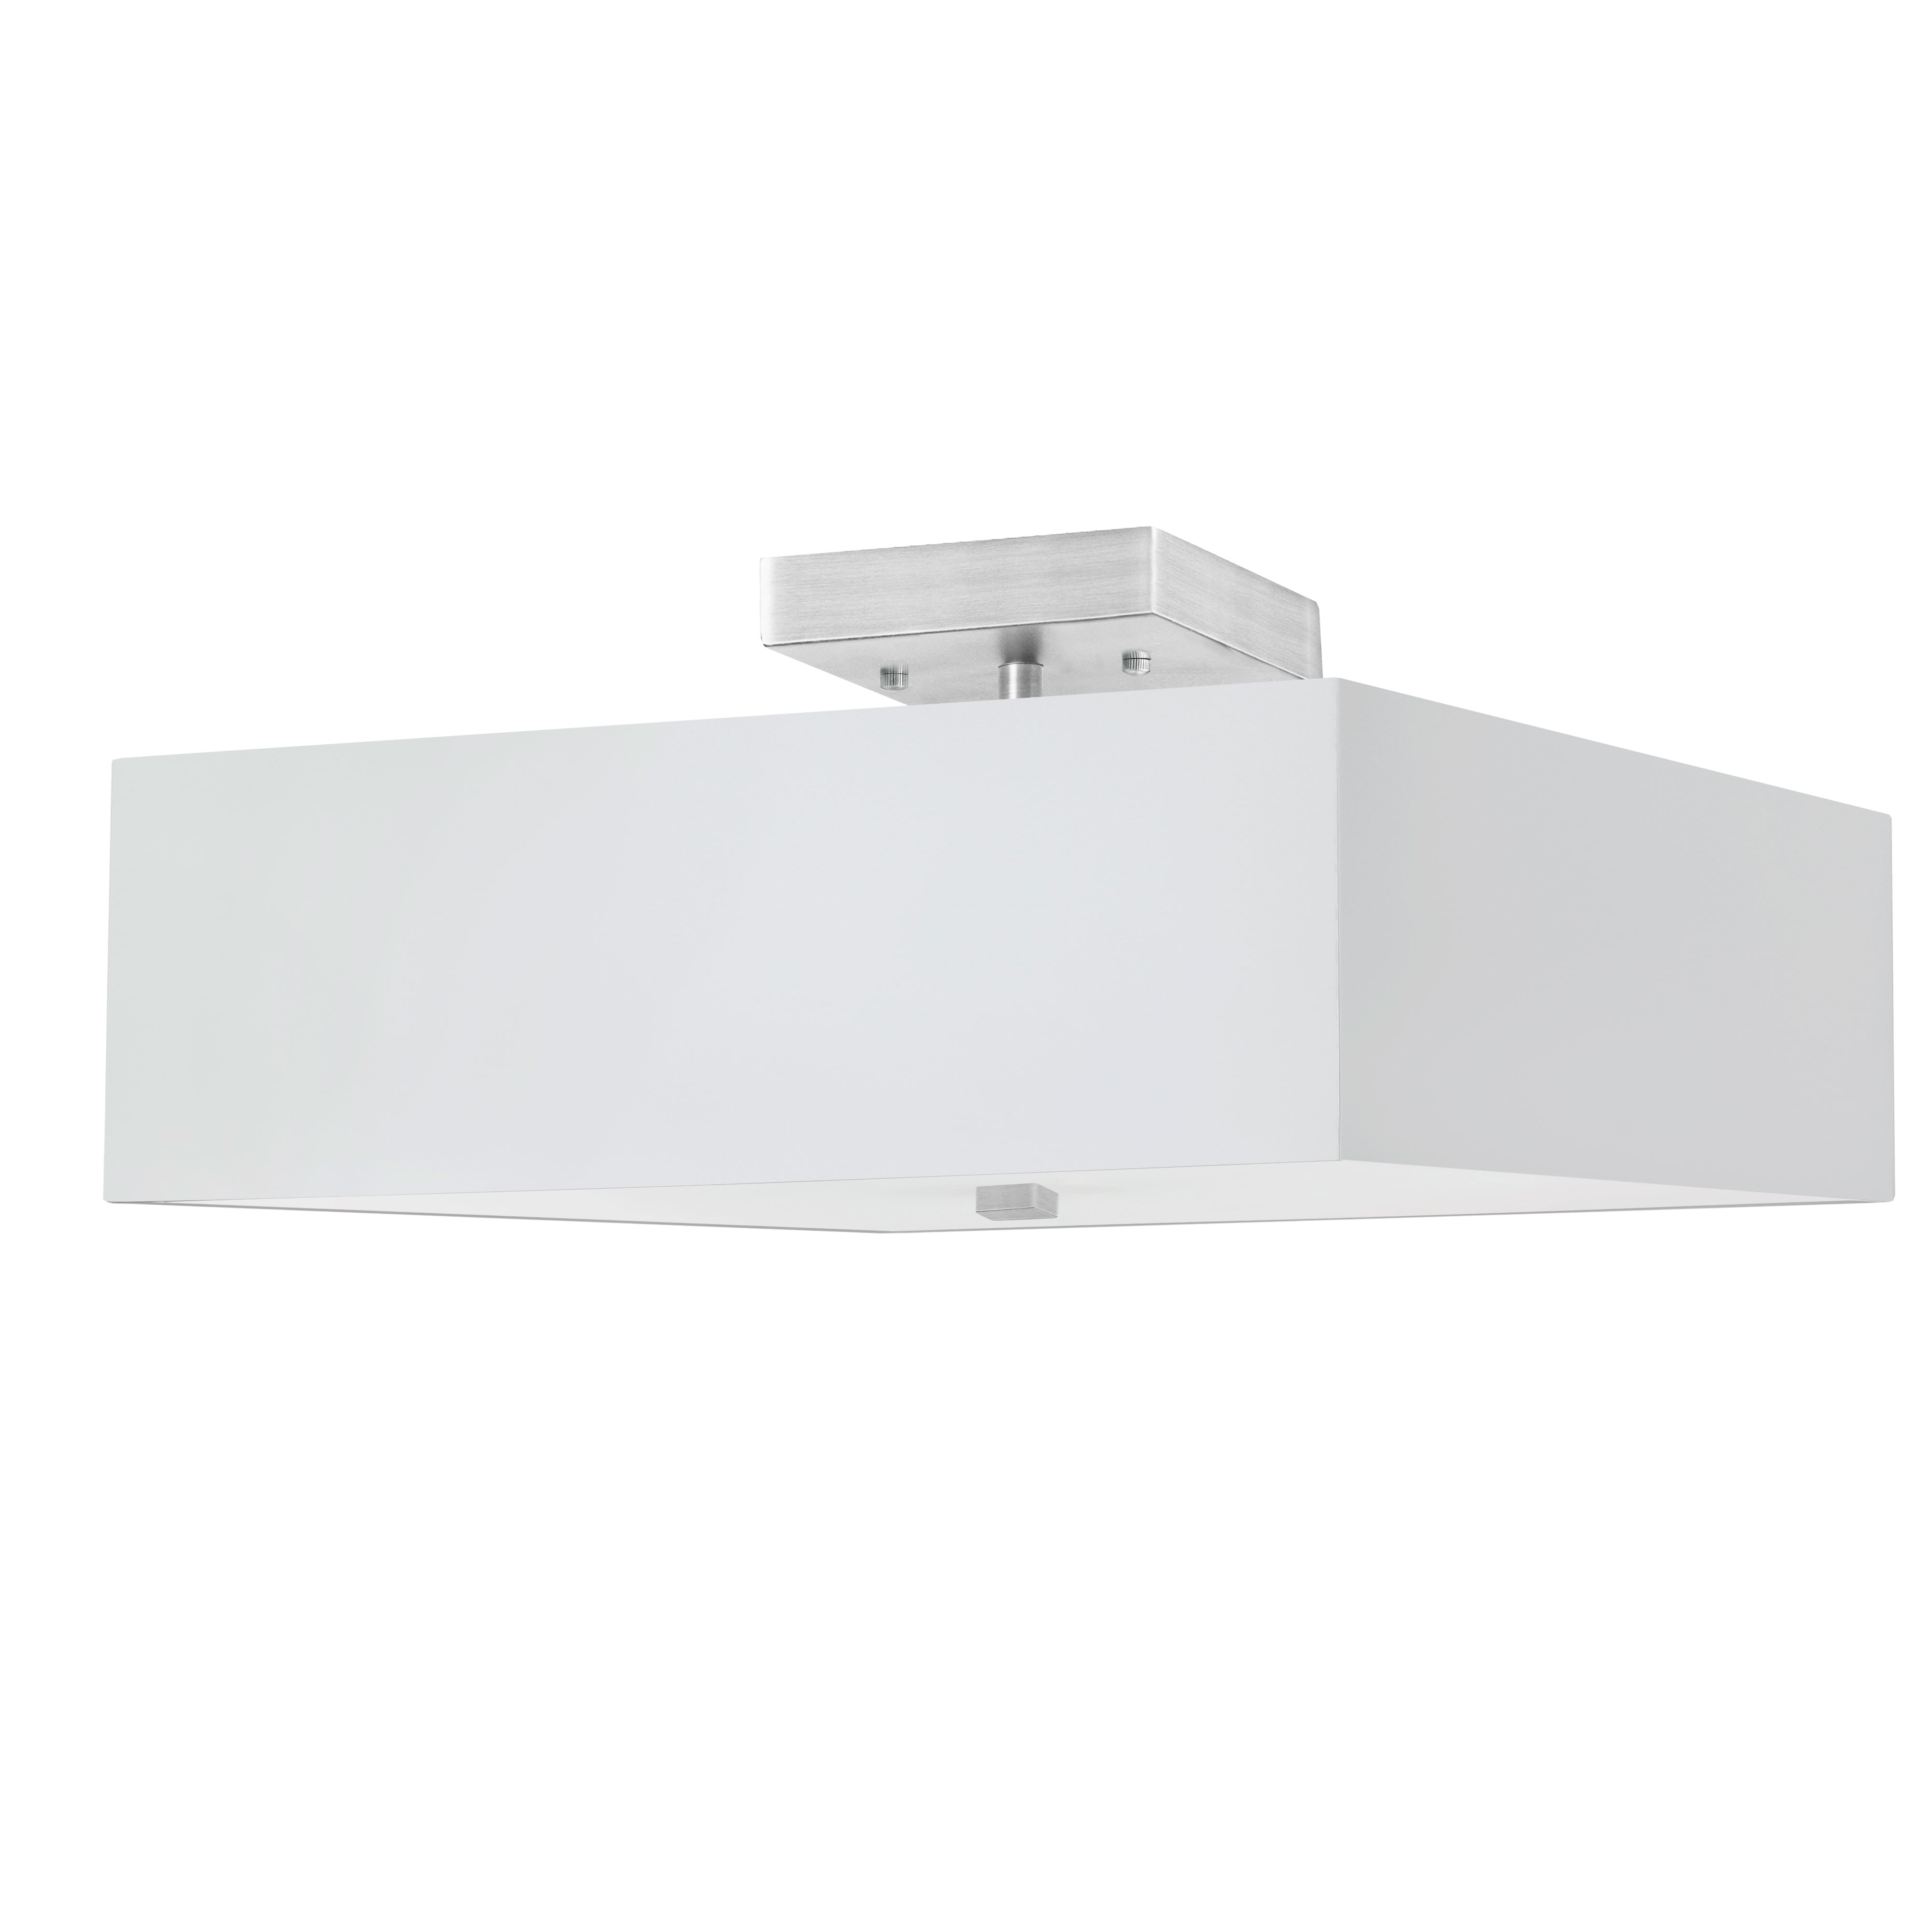 3LT Incandescent Semi-Flush SC w/ White Shade